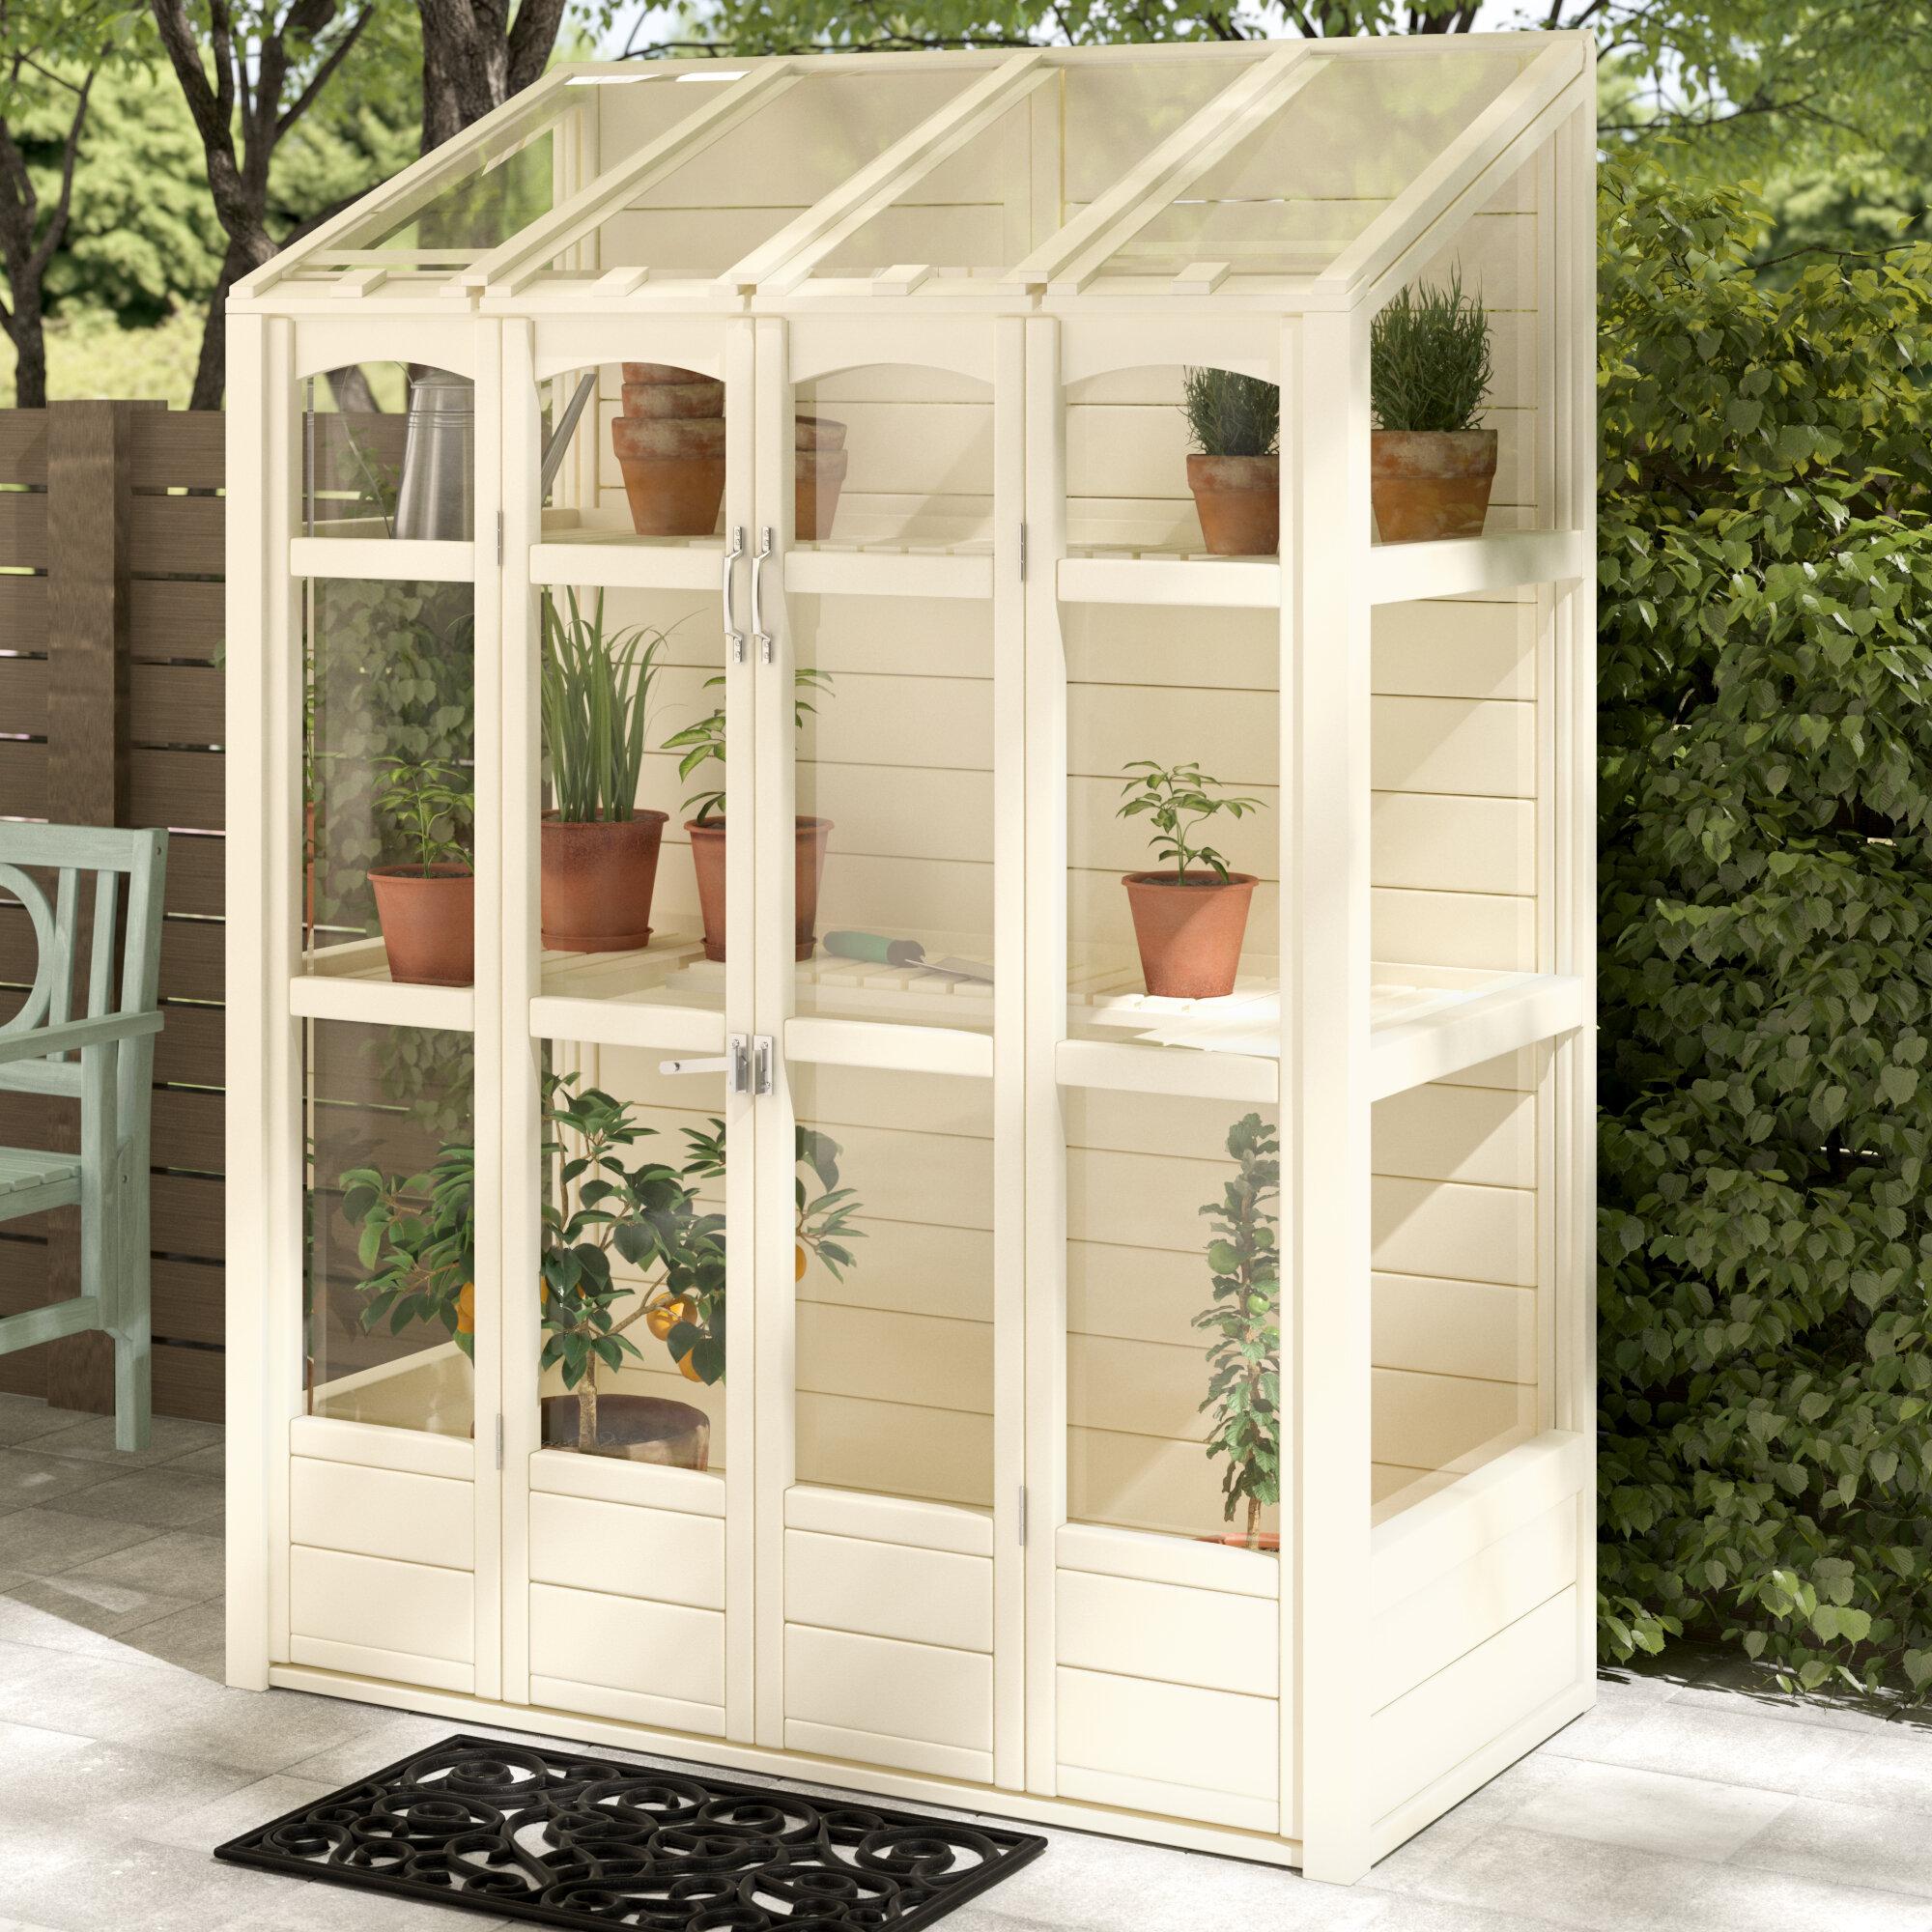 Bel étage 5 ft w x 2 ft d lean to greenhouse reviews wayfair co uk